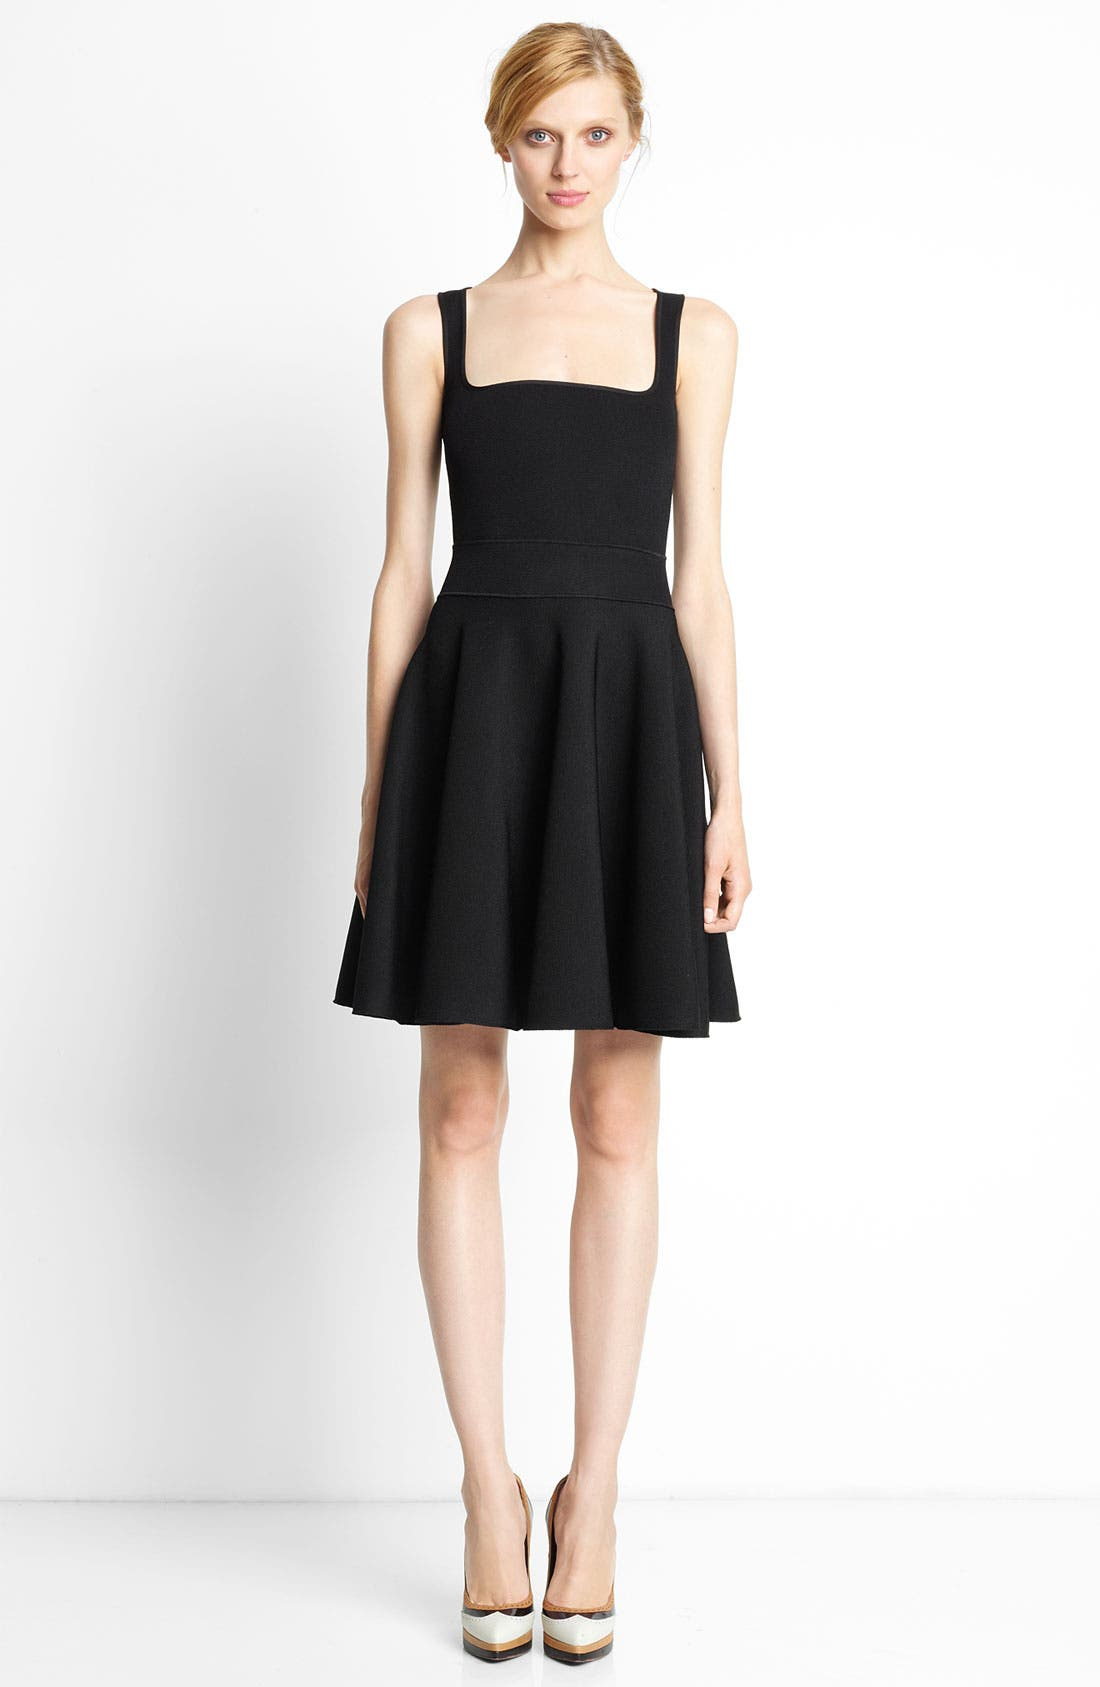 Alternate Image 1 Selected - Lanvin Sleeveless Knit Dress